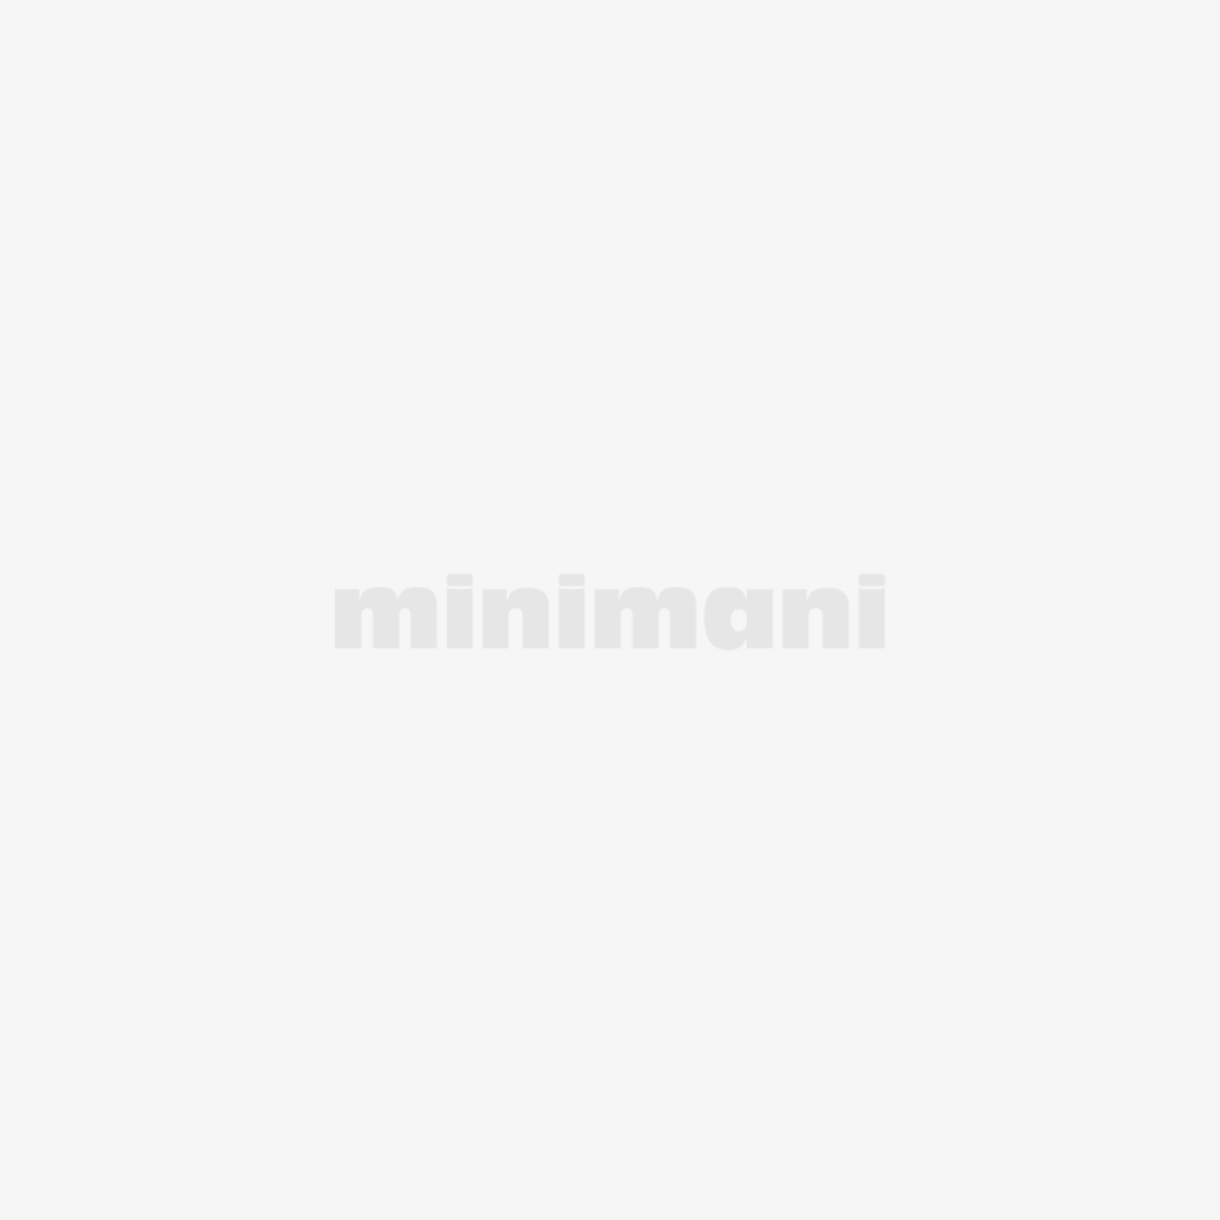 ONLY4DOGS COMBO-KUPPI XL 1400ML